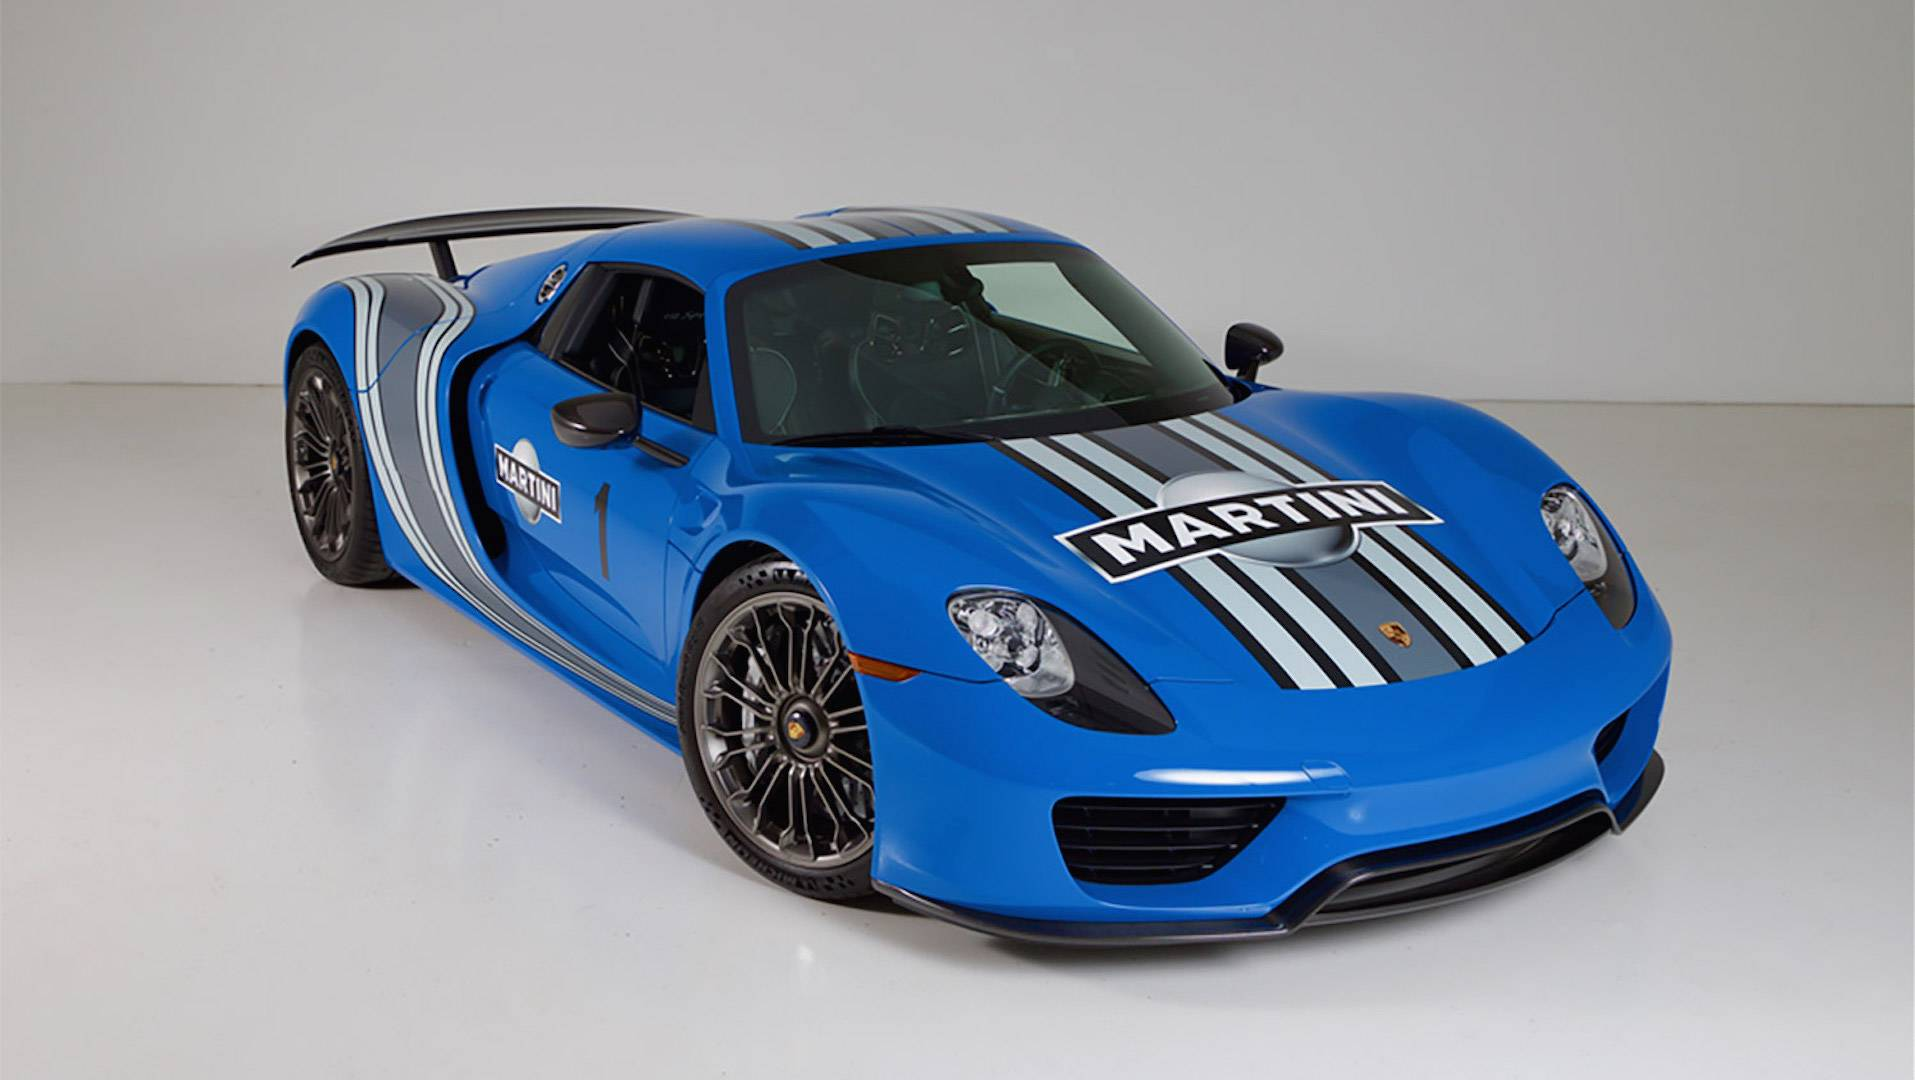 Buy The World\u0027s Only Factory VooDoo Blue Porsche 918 Spyder